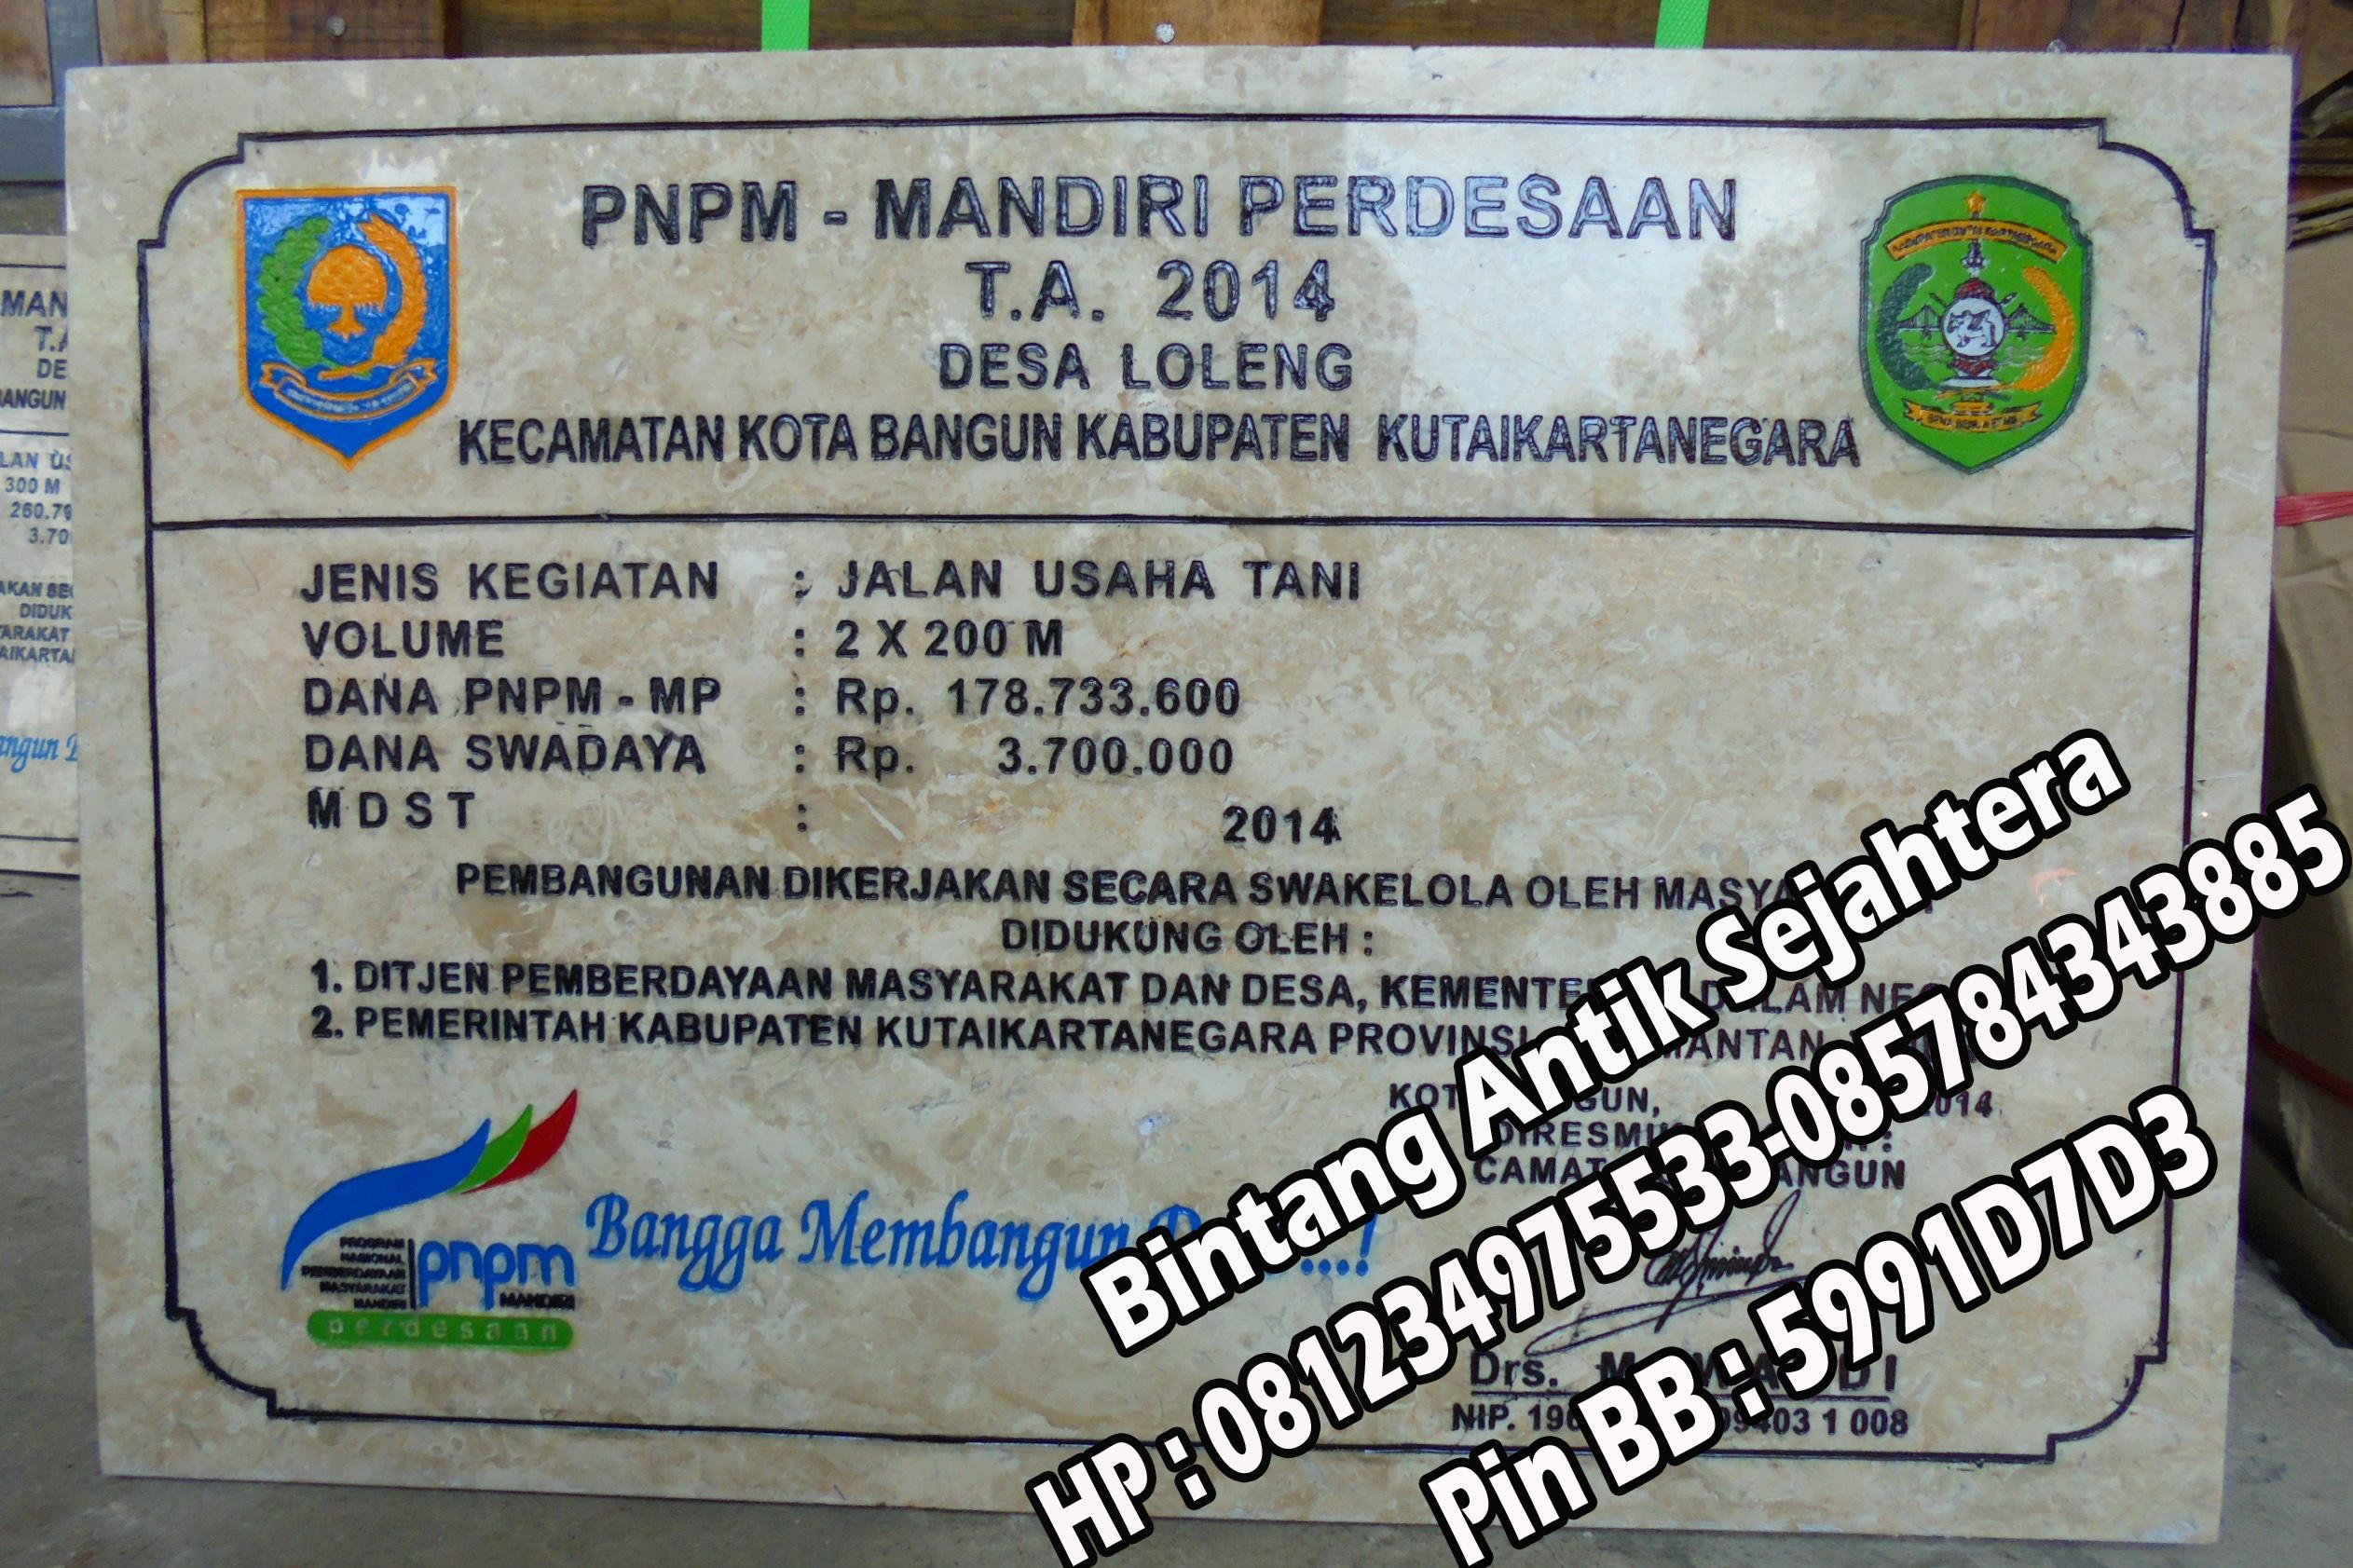 Jual Prasasti Marmer, Prasasti PNPM Marmer Tulungagung